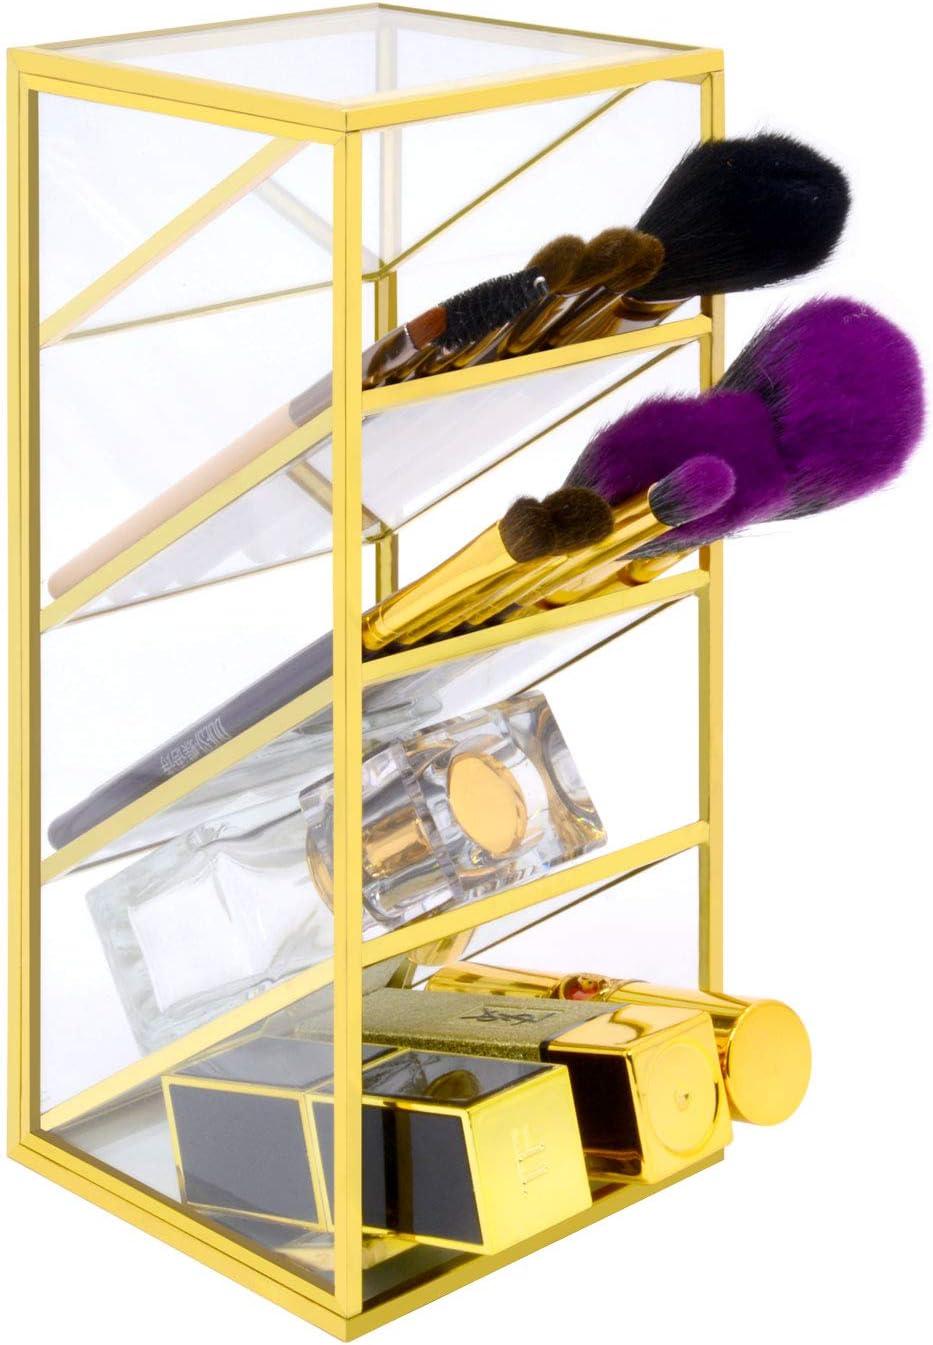 VoiceFly Brush Pen Holder Storage, Vintage Makeup Organizer Gold Metal Dresser Organizer, Brushes Eyeliner Lipstick Pen Storage for Home Office Supplies, 4 Compartments